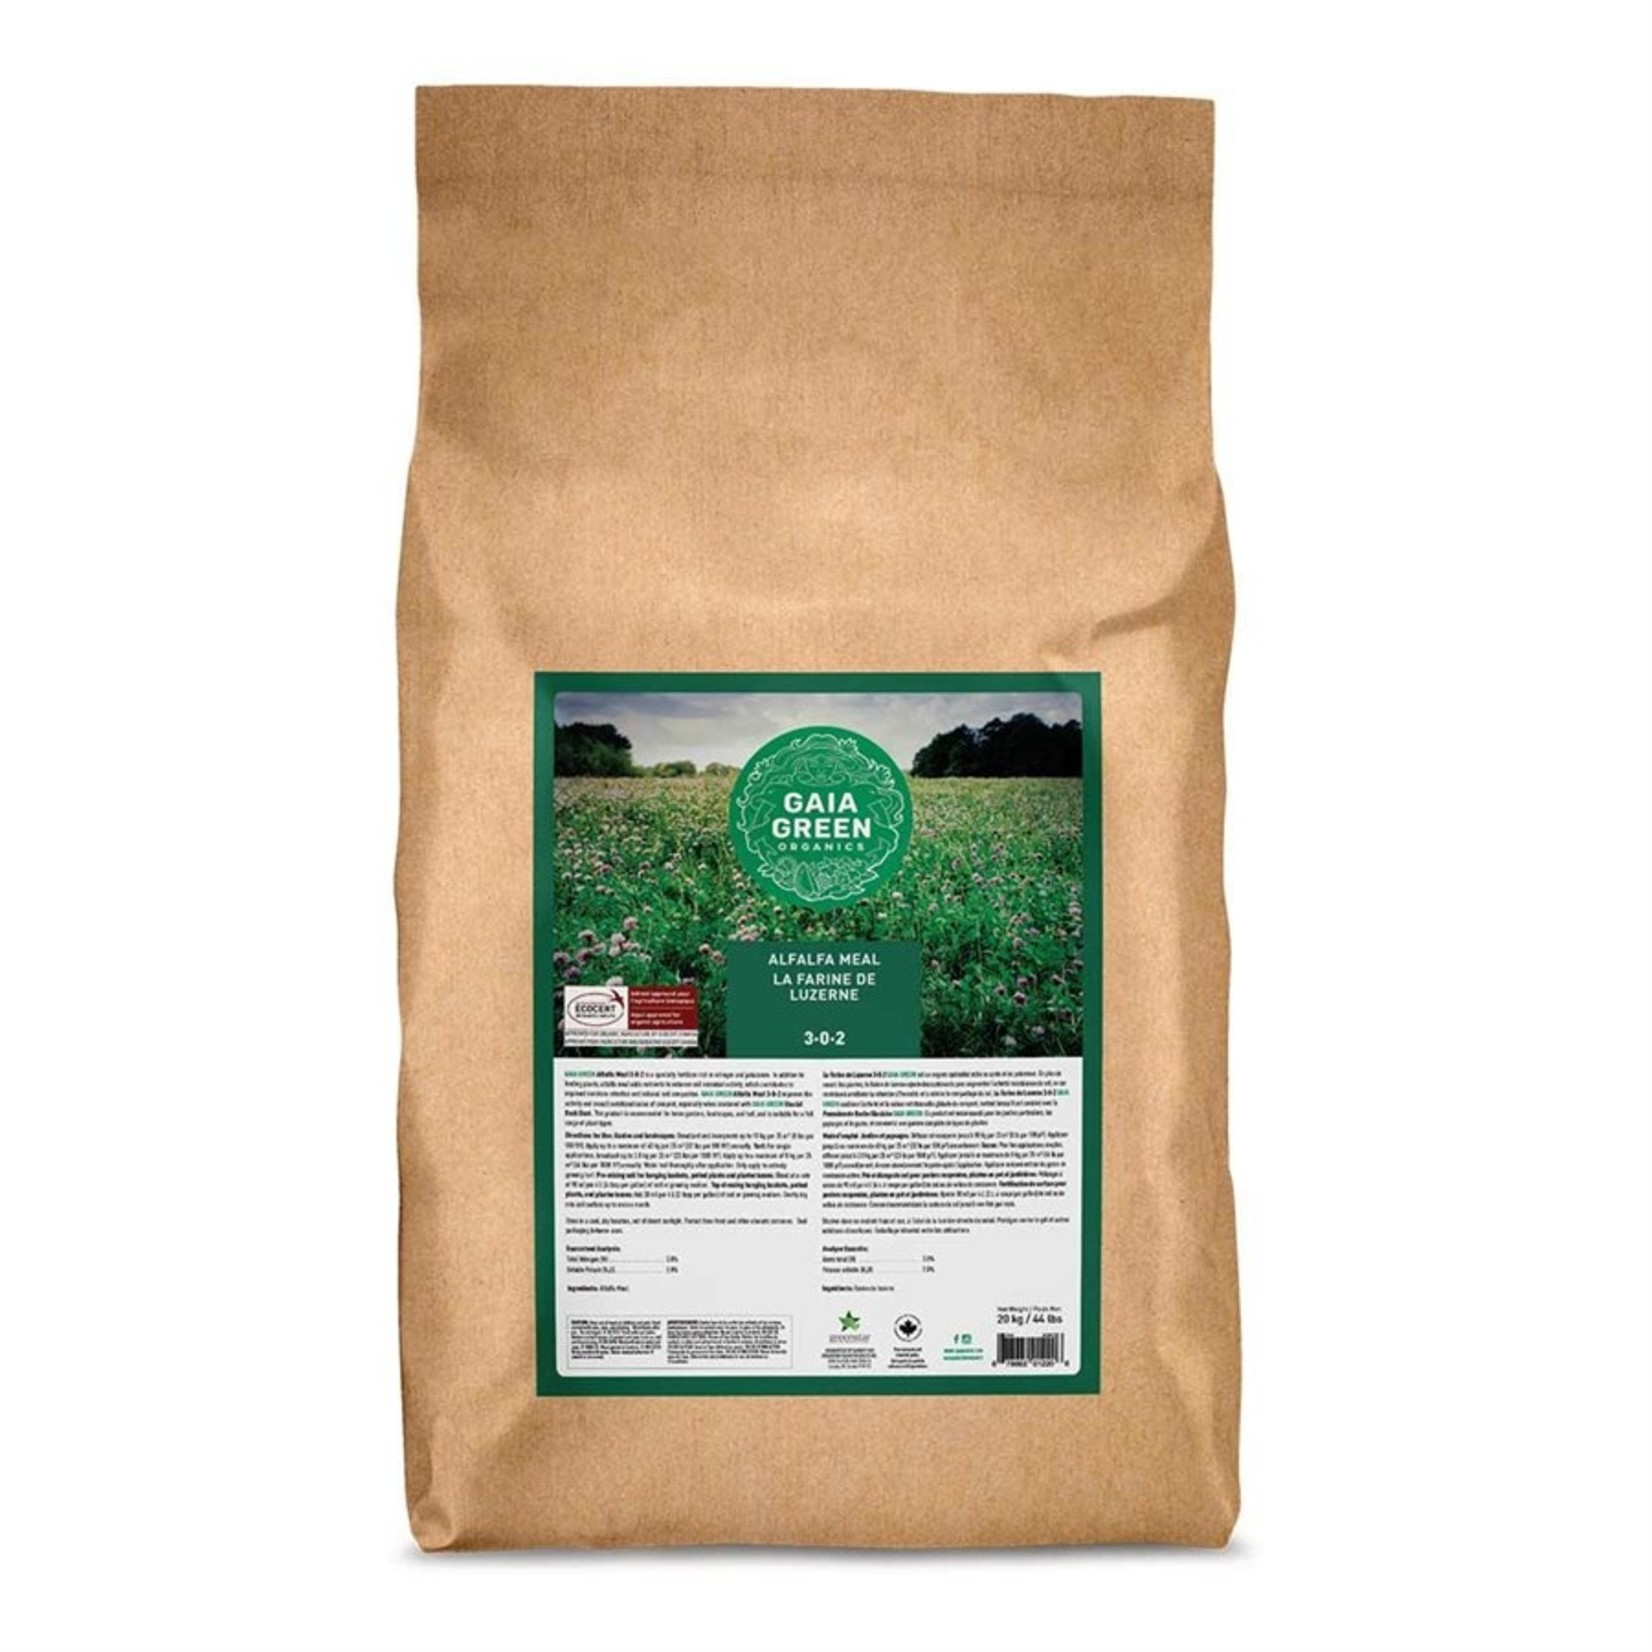 gaia green GAIA GREEN ALFALFA MEAL 3-0-3 20KG